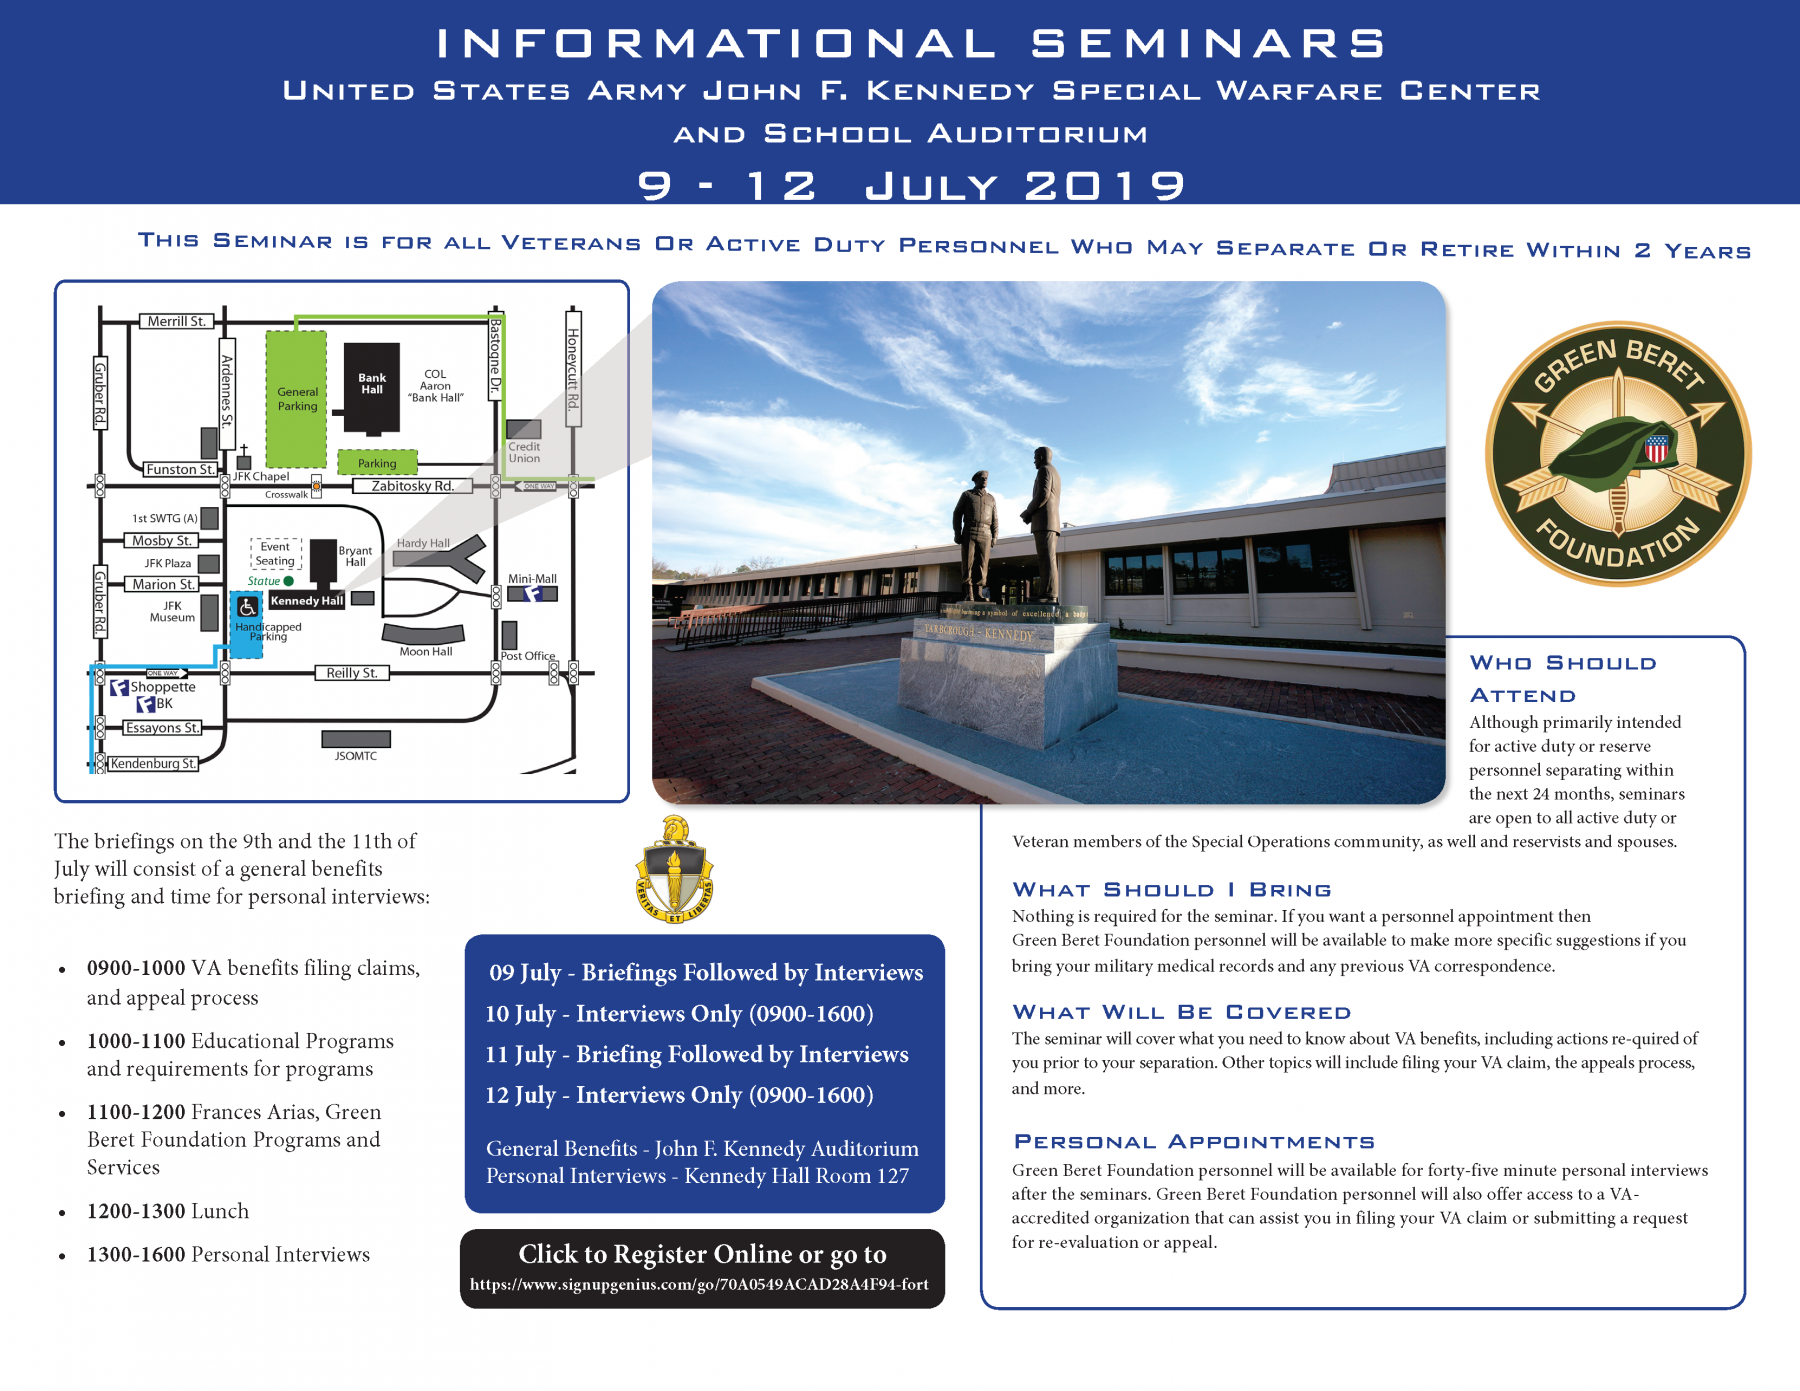 GBF OASIS 2019 Fort Bragg